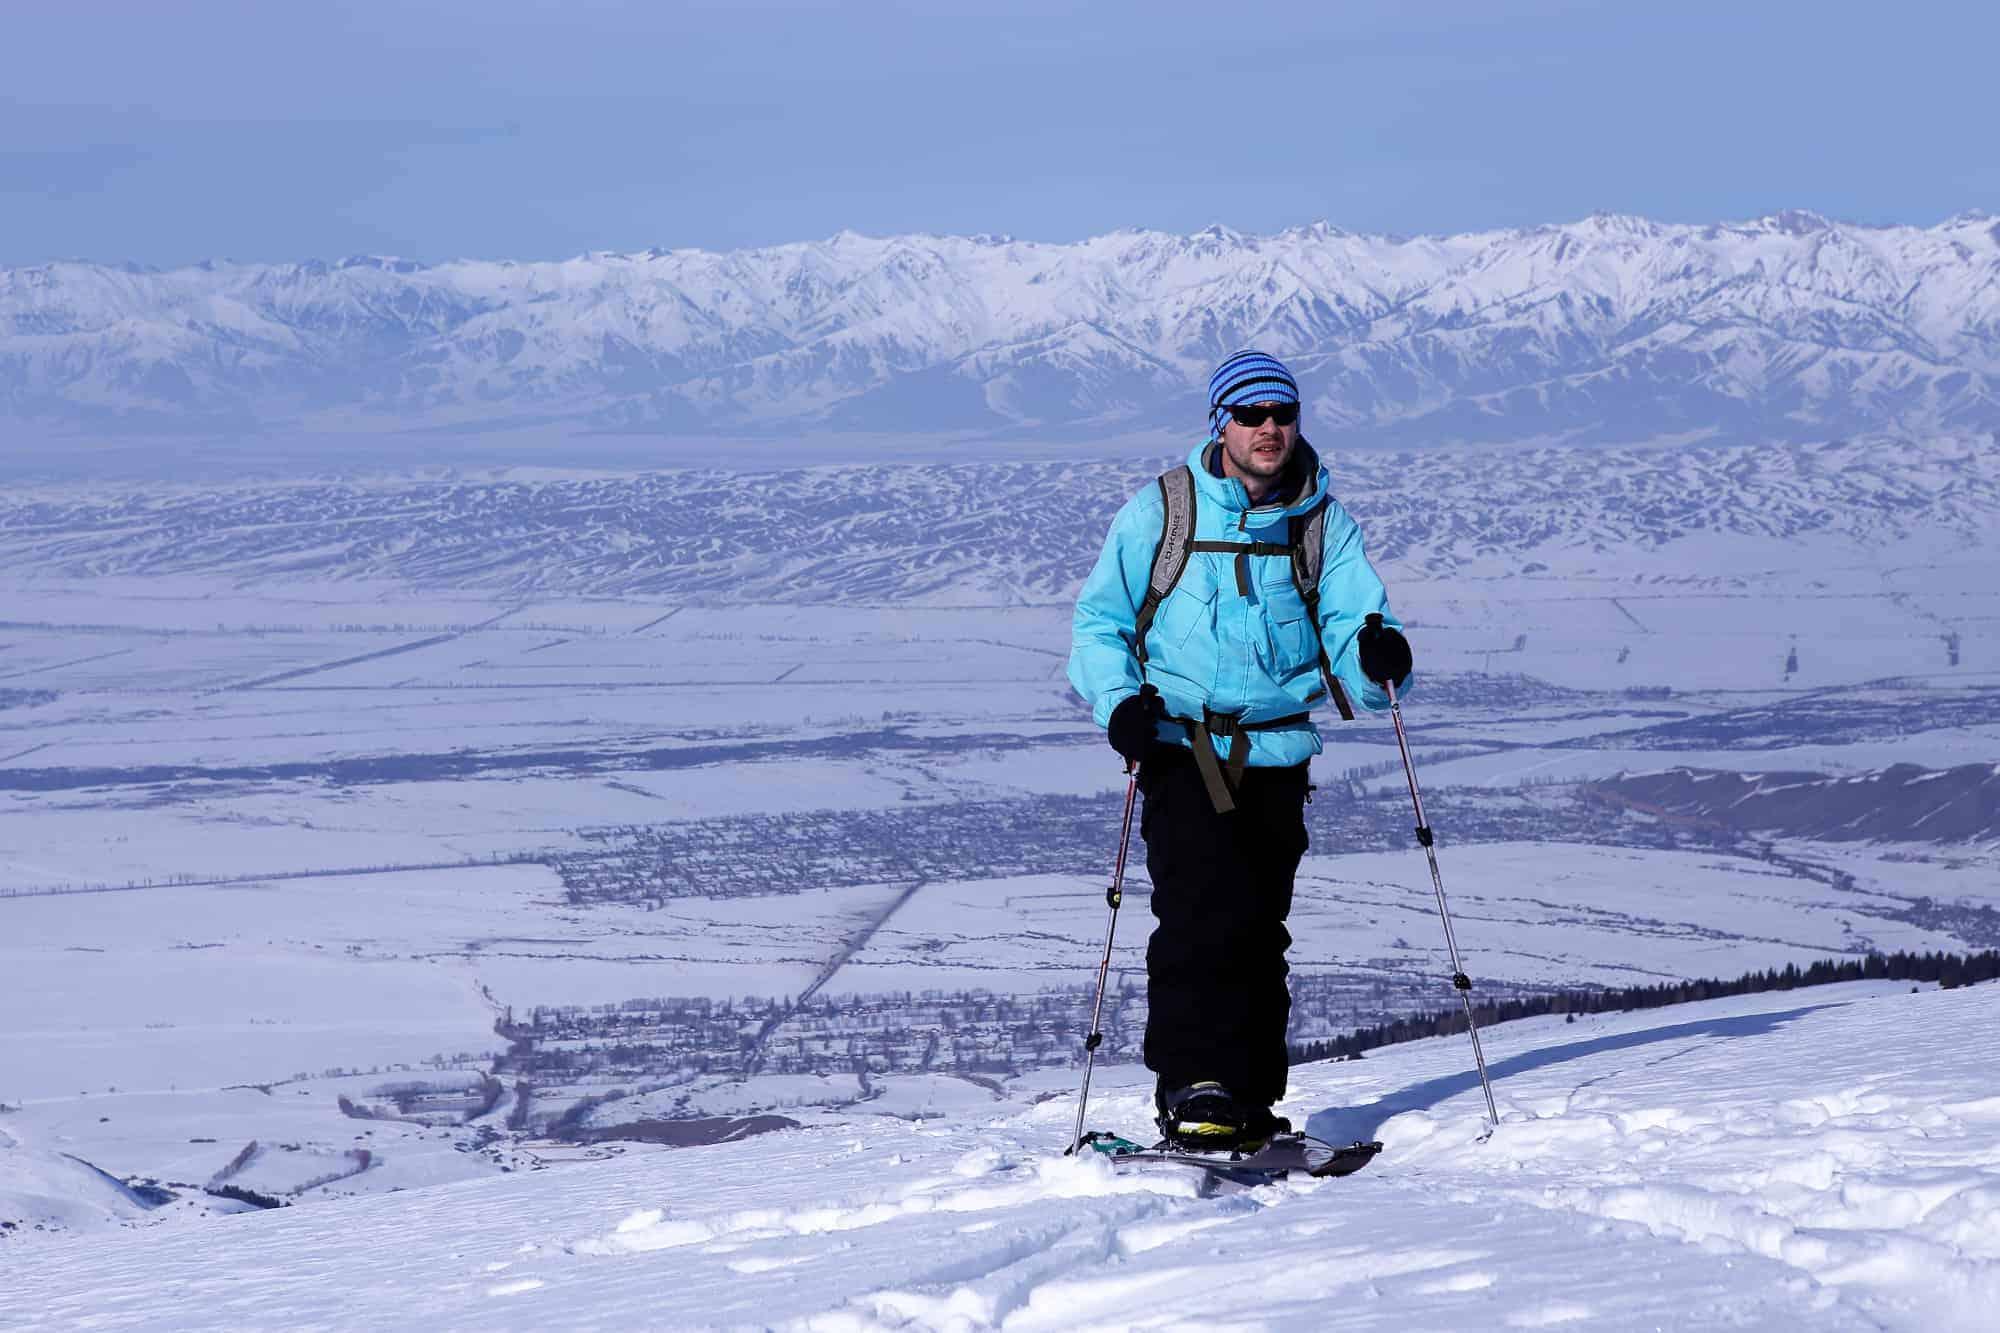 Jyrgalan Skiing